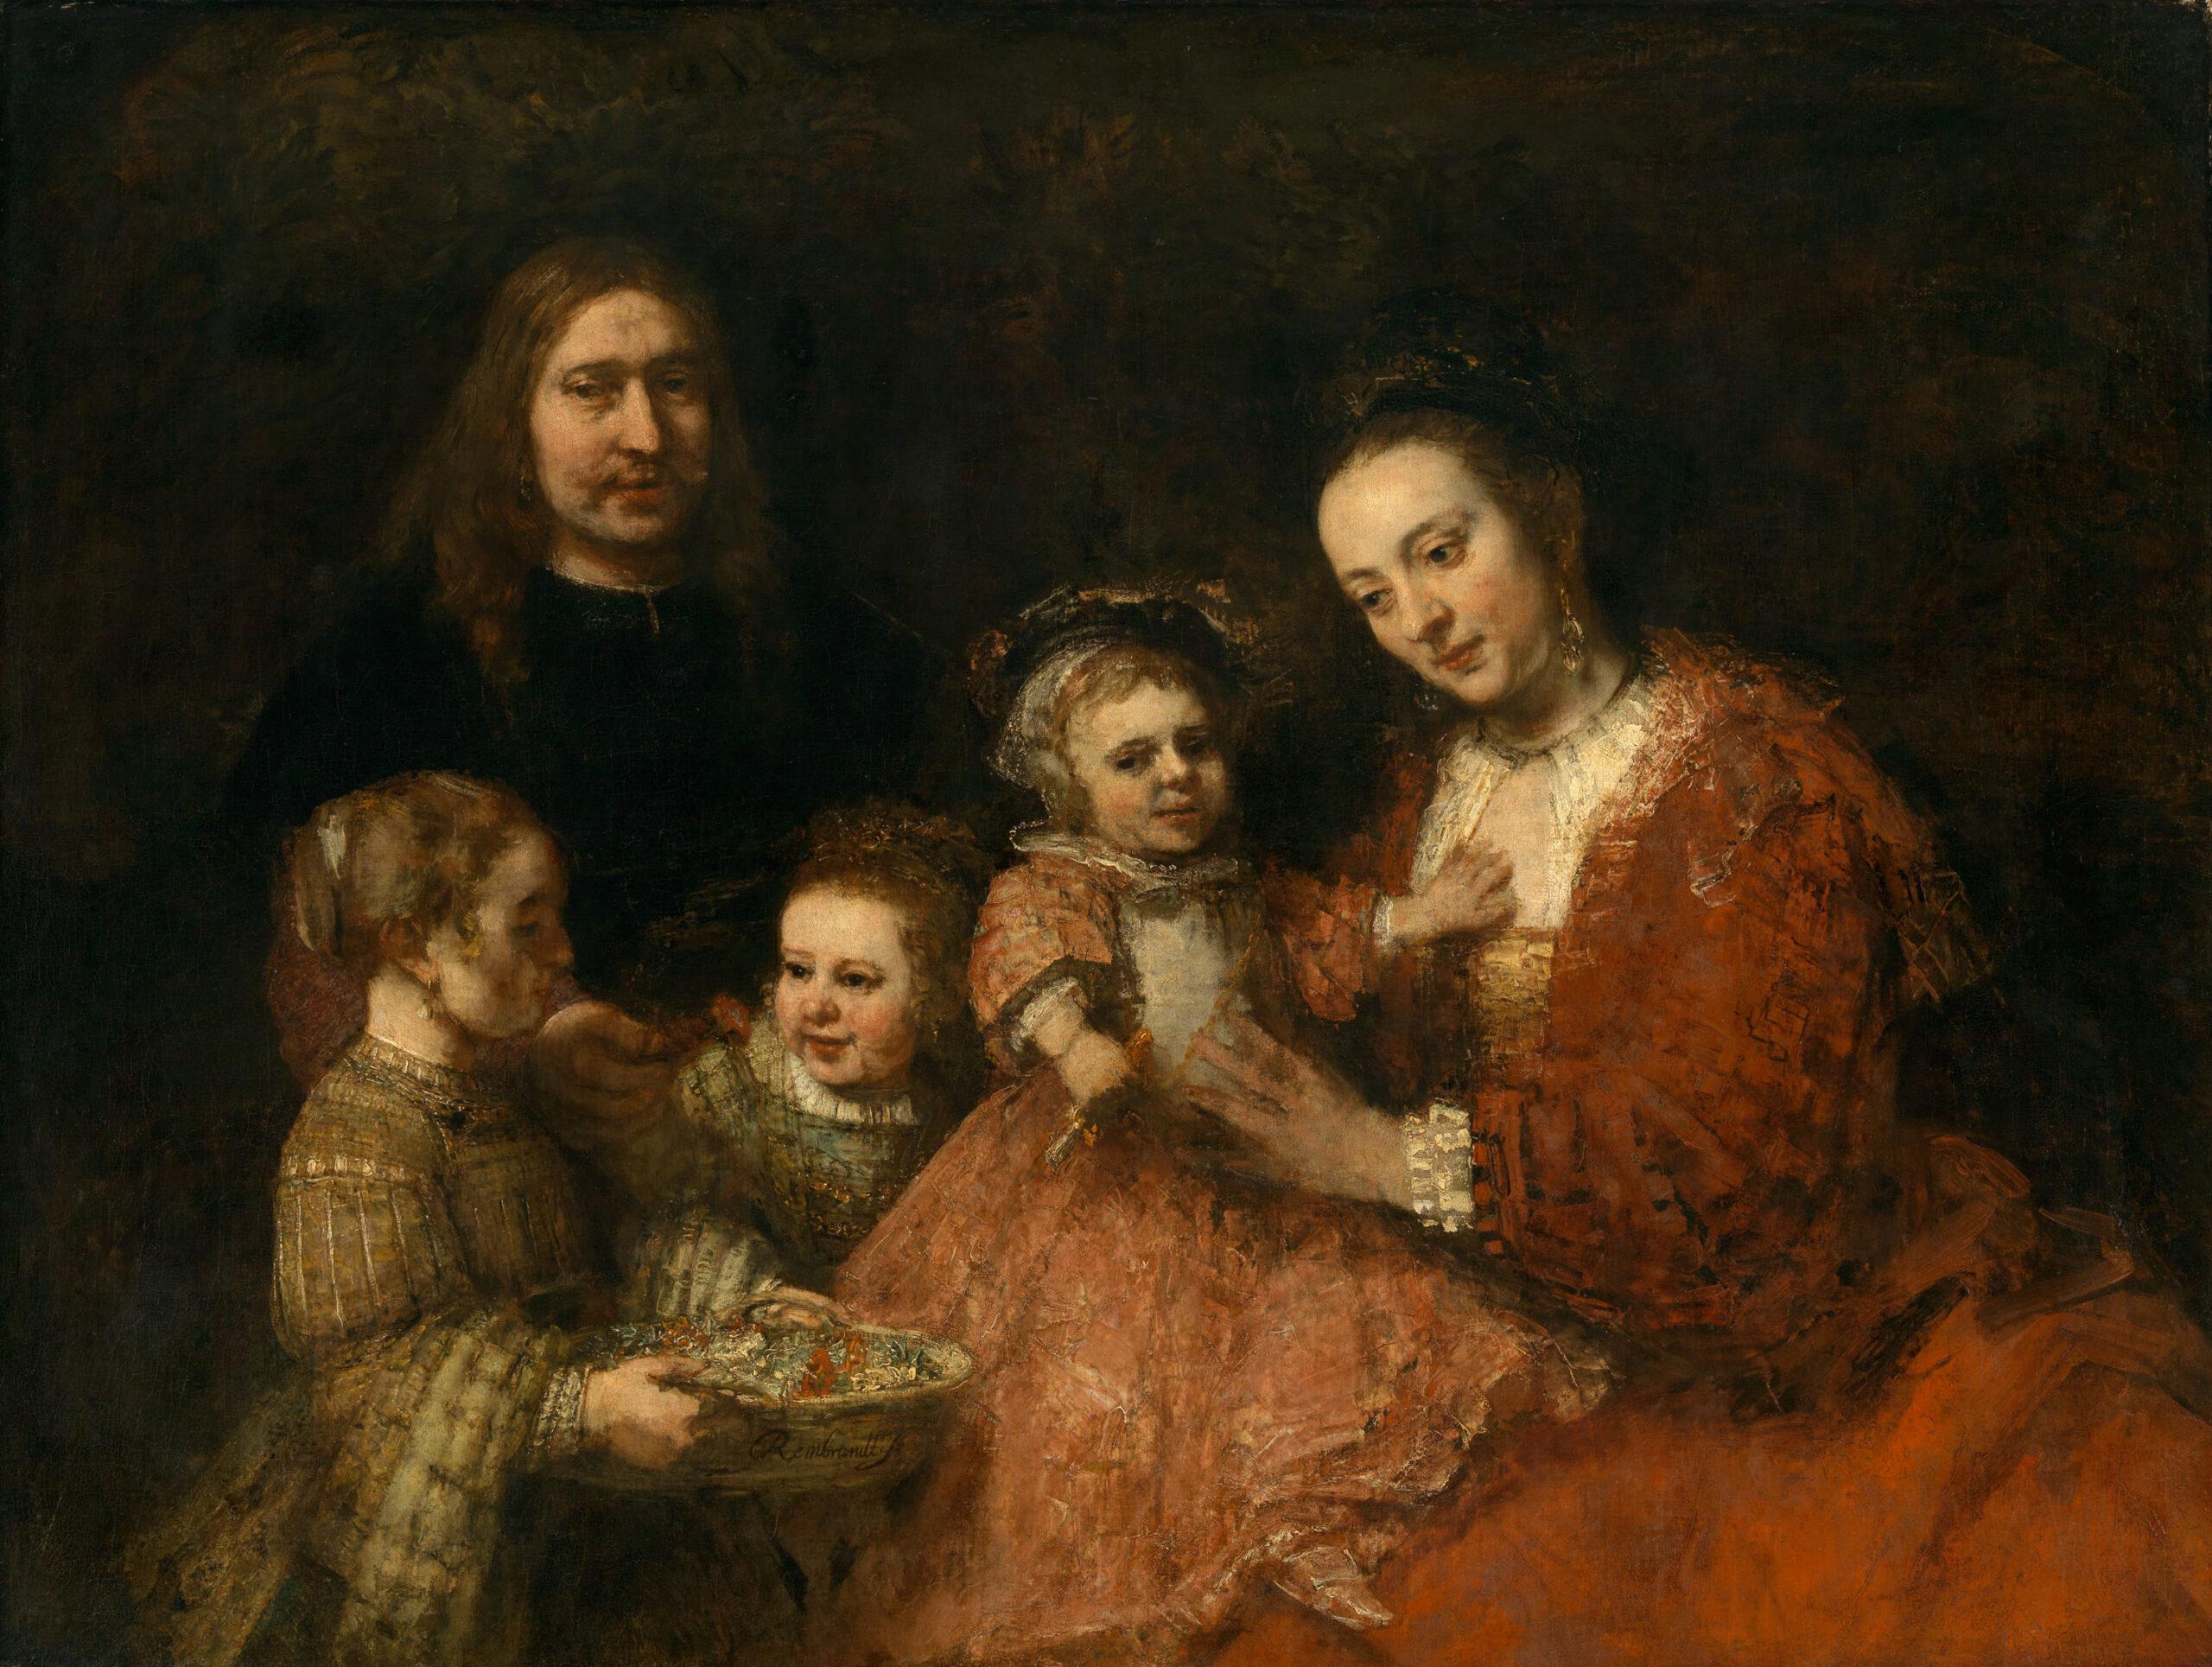 Fig. 8. Rembrandt Harmensz van Rijn (1606-1669), Portrait of a Family, ca. 1668, canvas, 126 x 167 cmHerzog Anton Ulrich-Museum Braunschweig, inv. no. GG 238